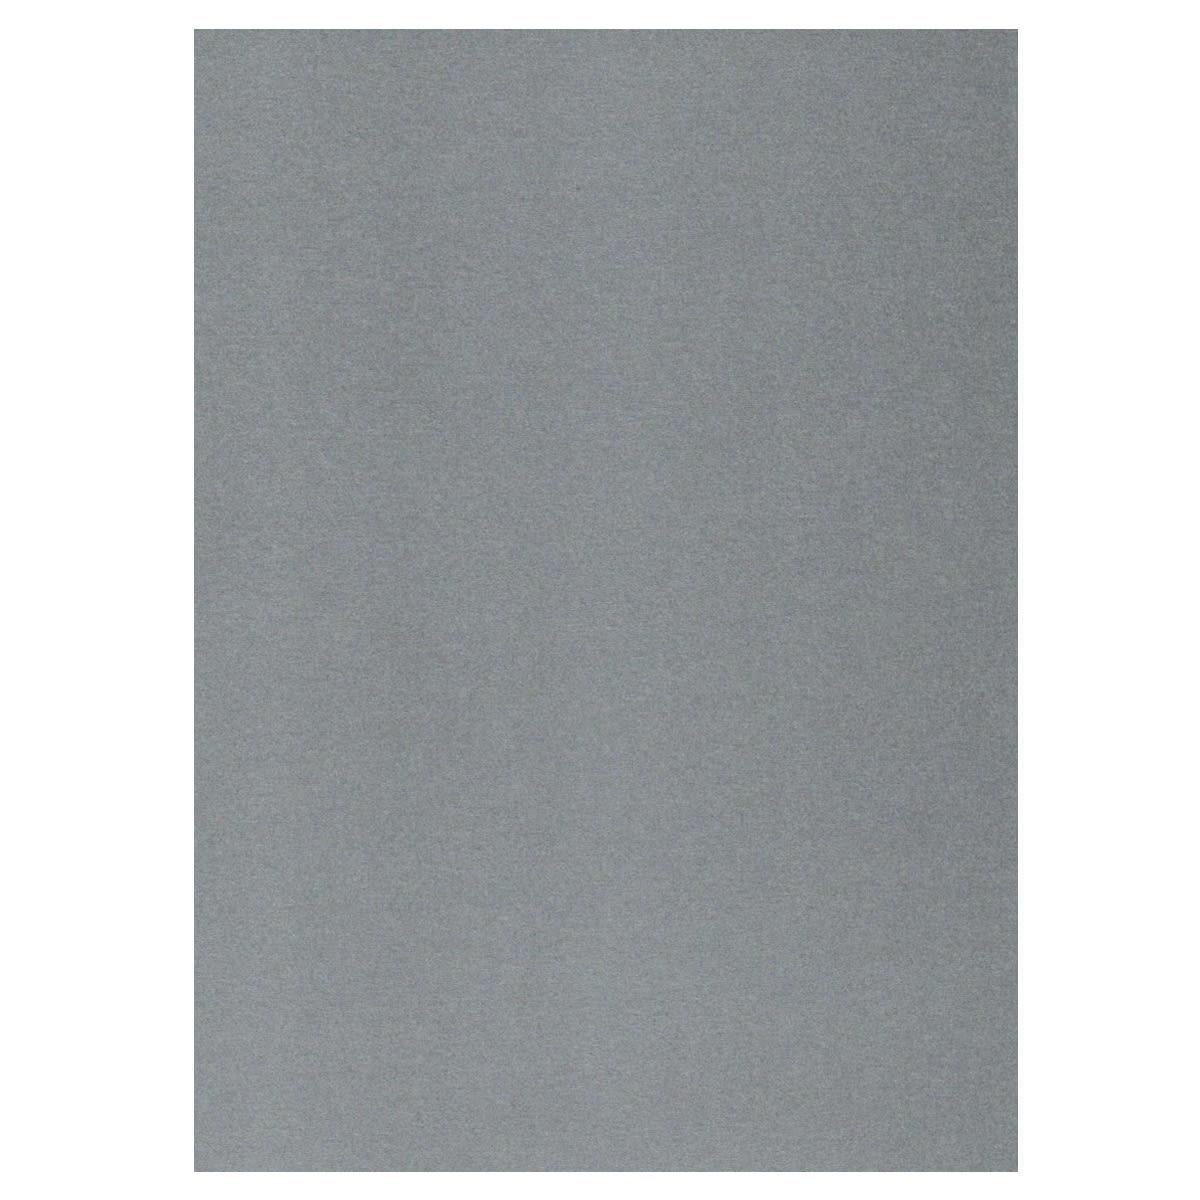 A4 PEARLESCENT PLATINUM CARD